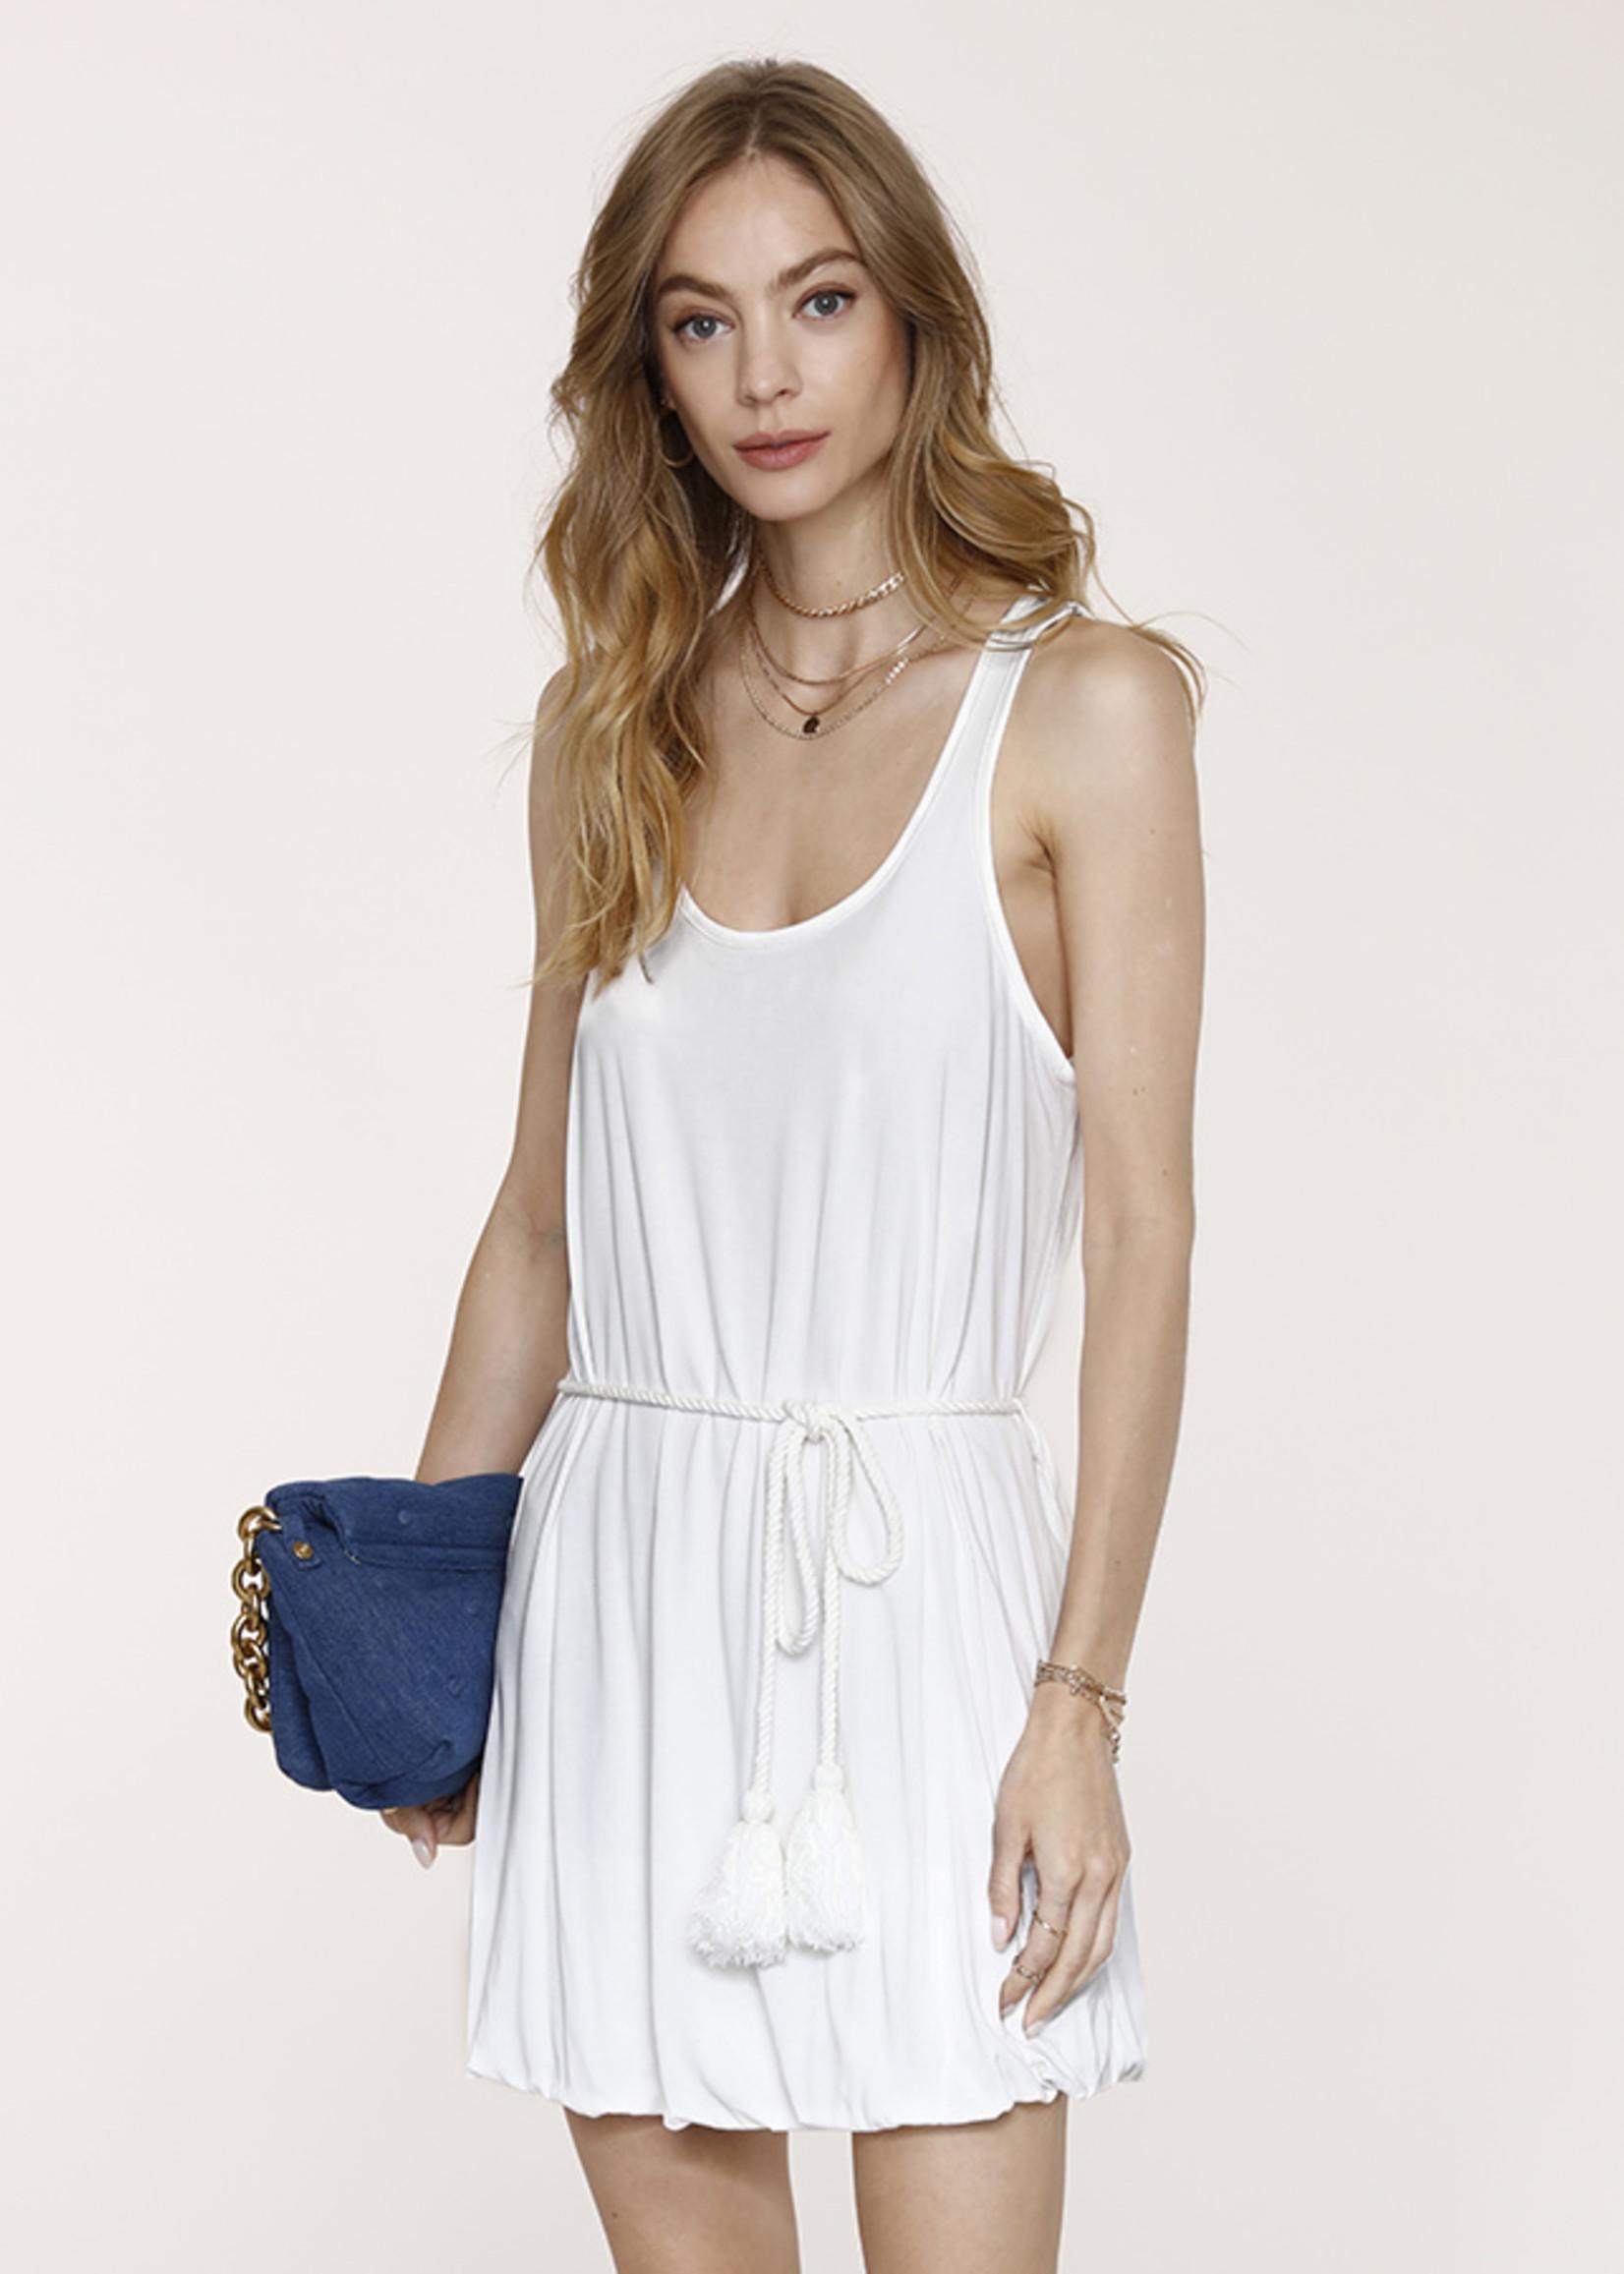 Elitaire Boutique June Dress in White